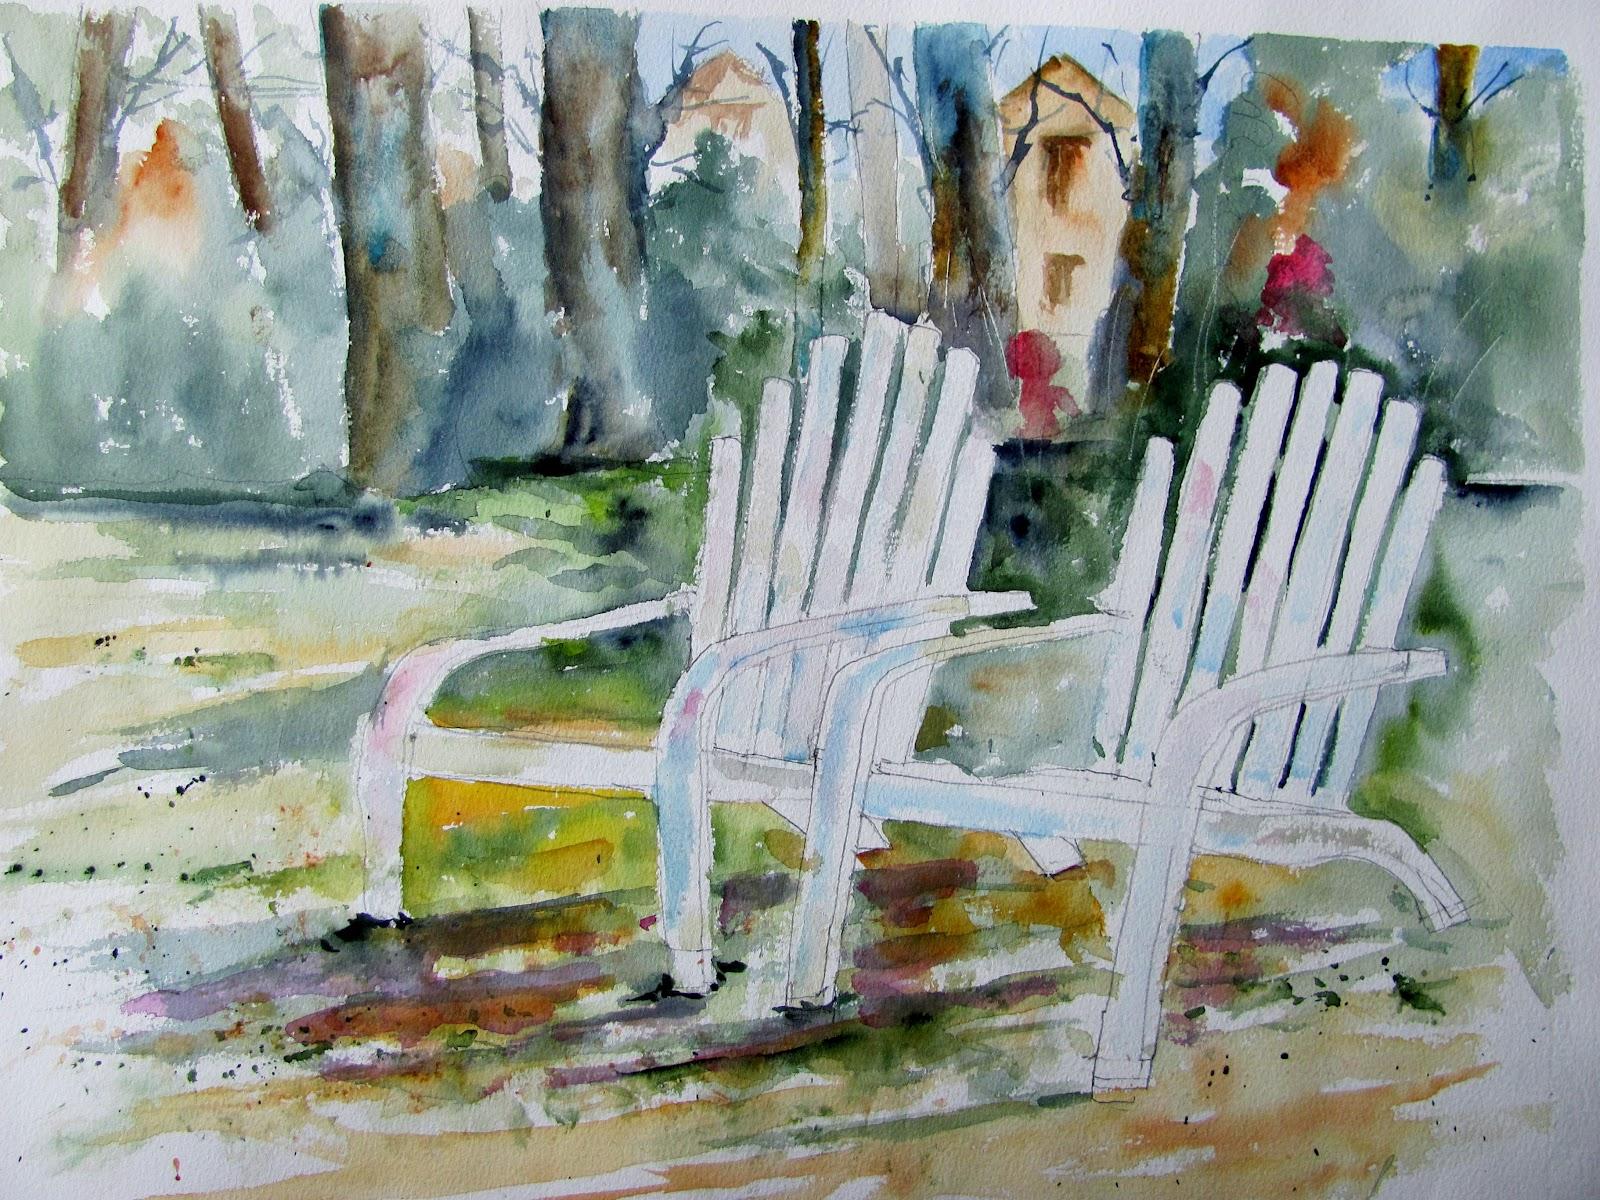 David Easy Redwood Porch Swing Plans Wood Plans Us Uk Ca